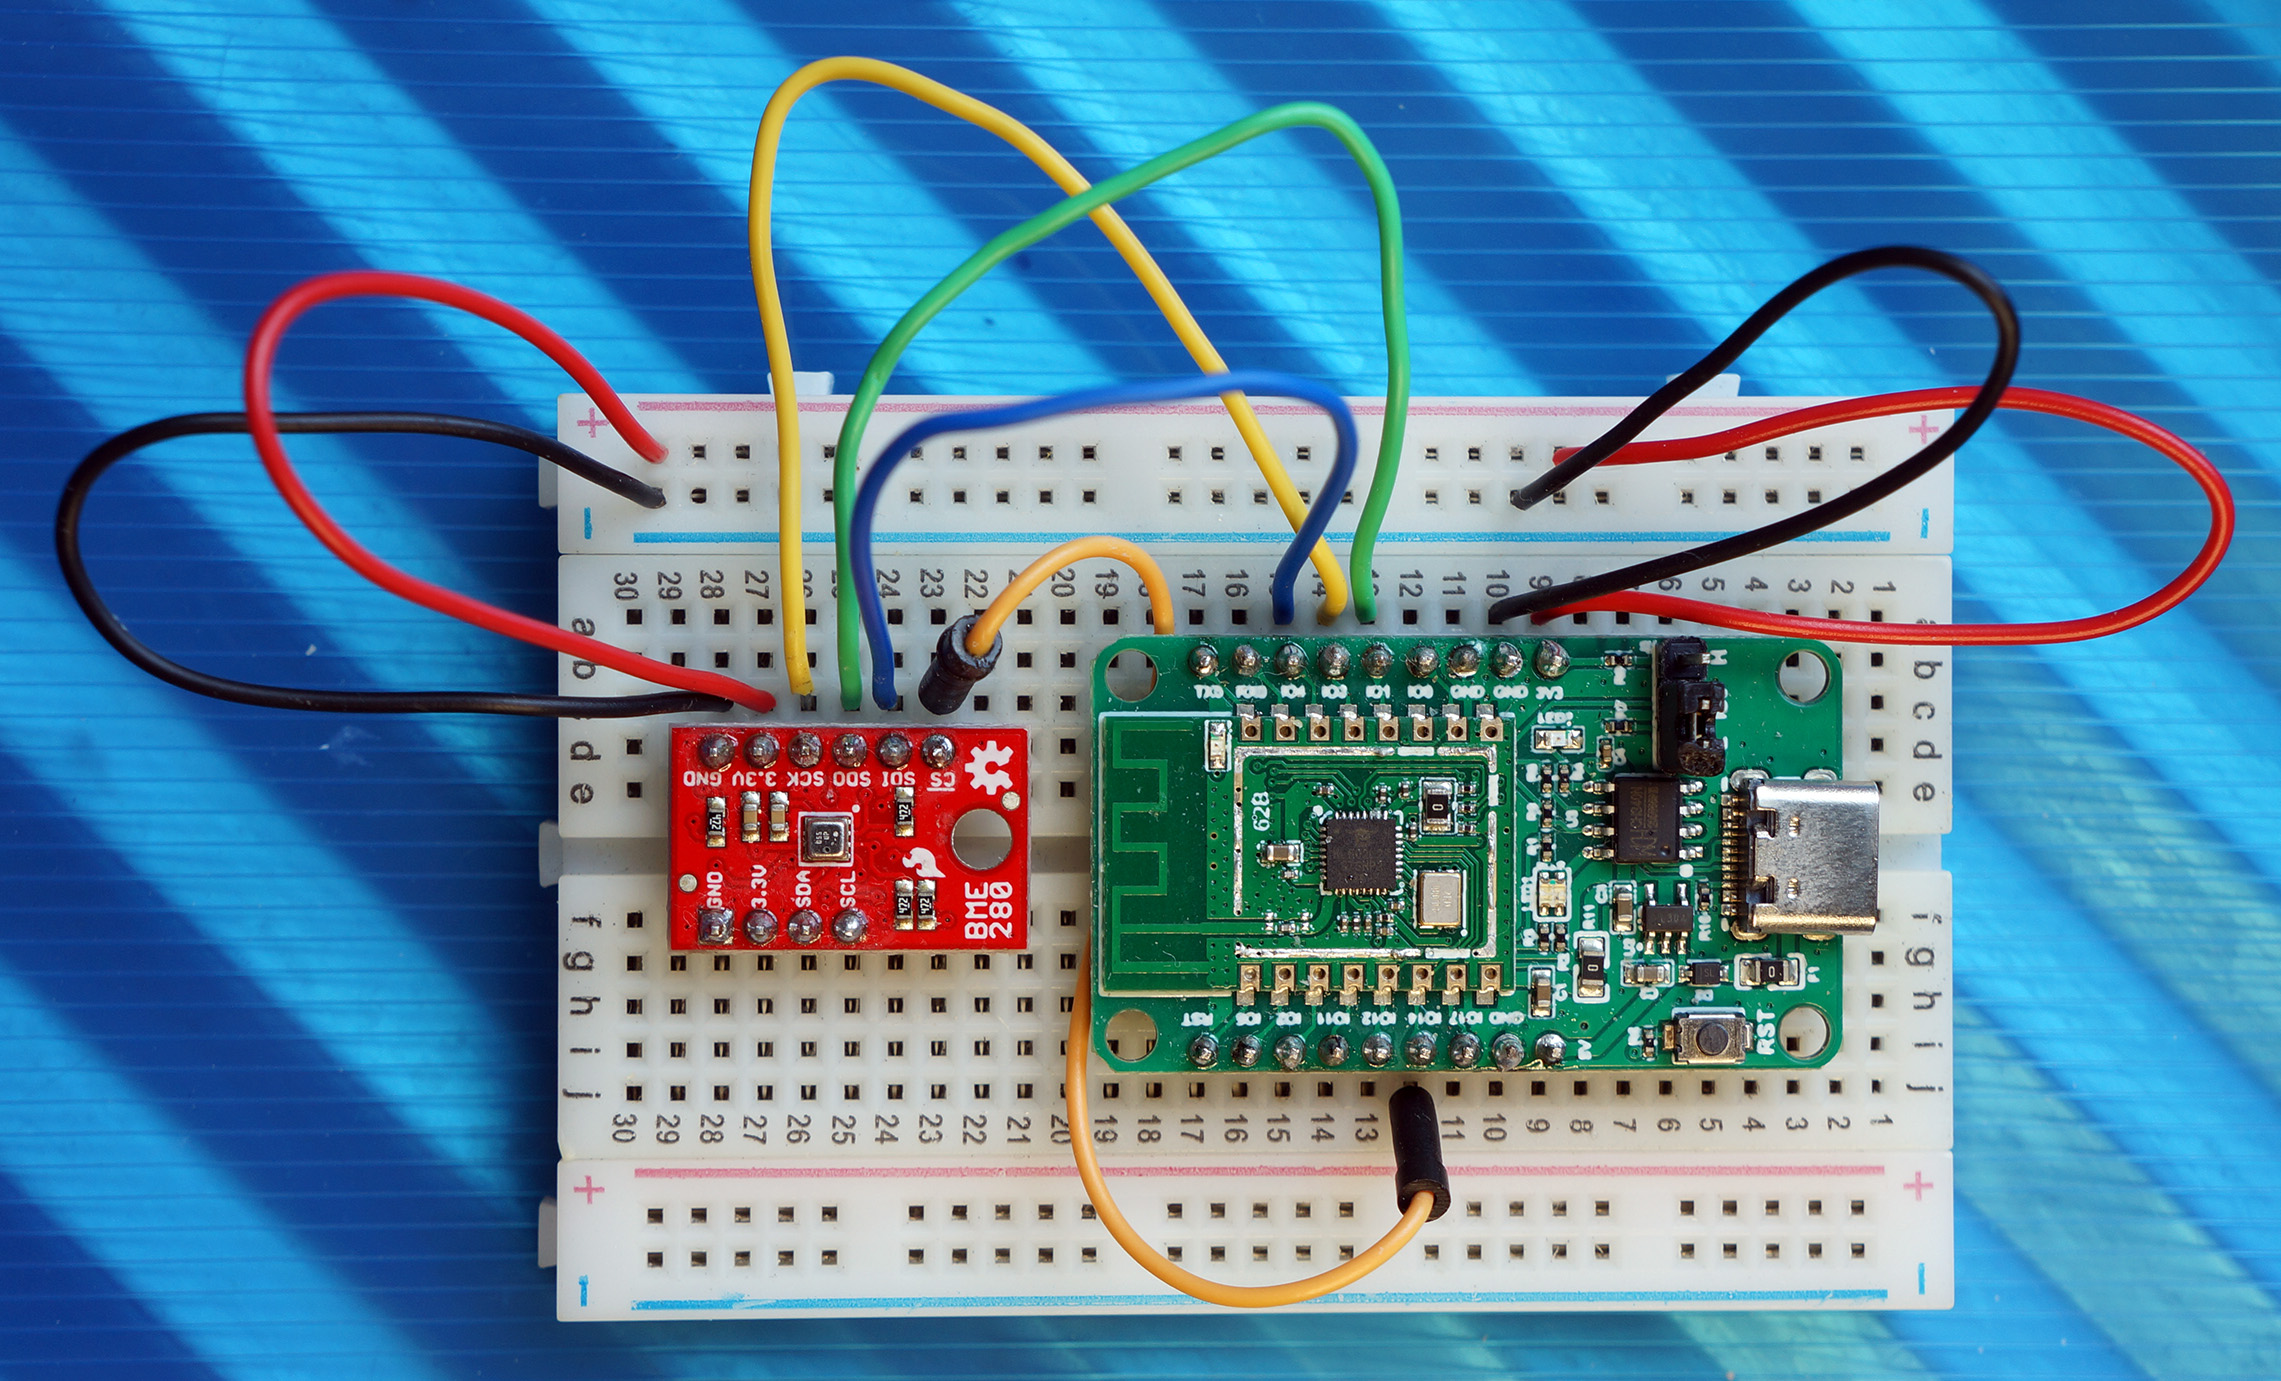 PineCone BL602 connected to SparkFun BME280 Sensor over SPI